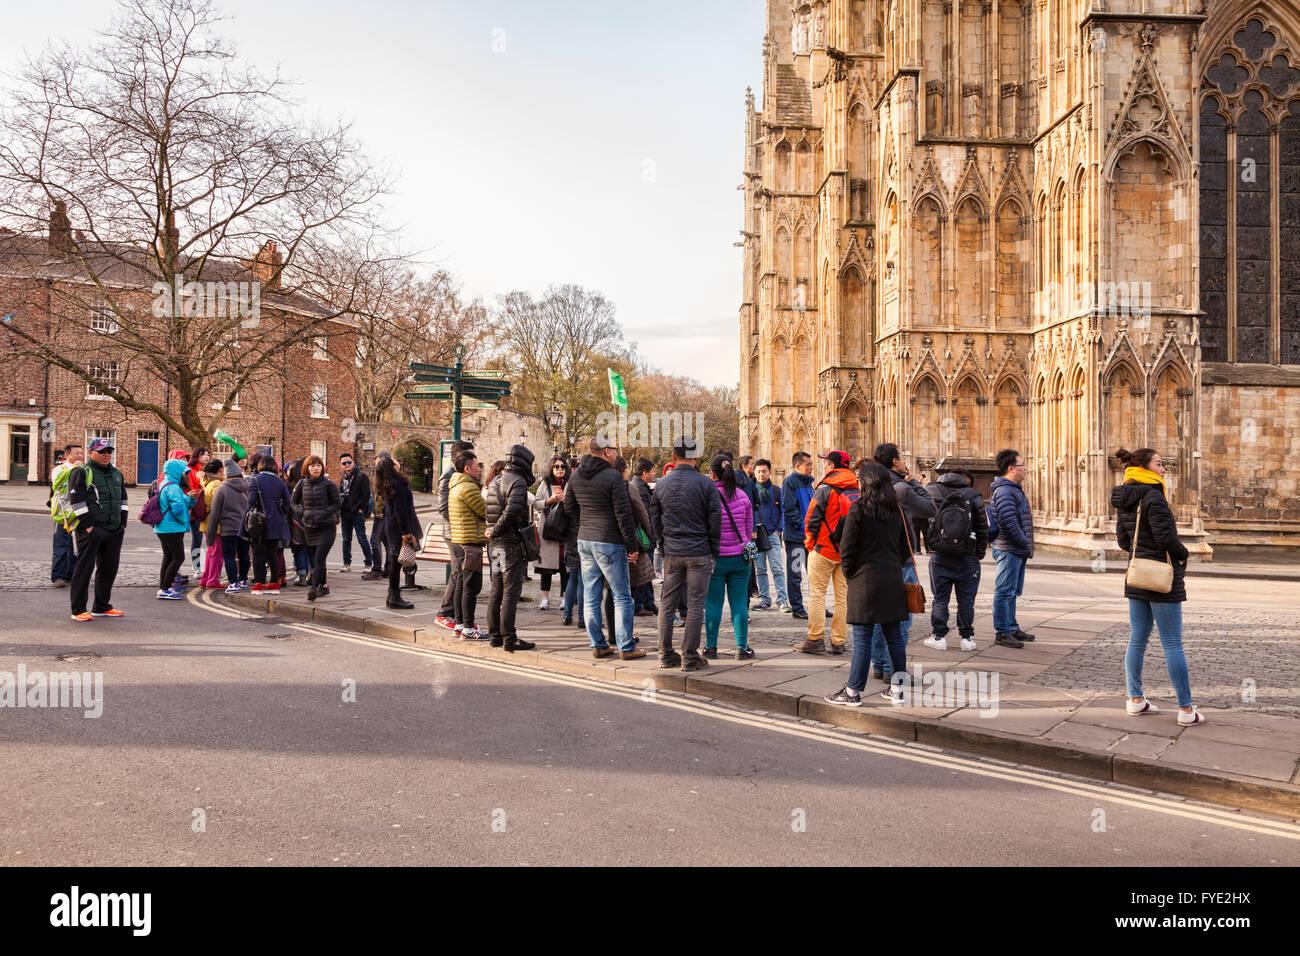 Gran grupo de turistas asiáticos en York Minster, North Yorkshire, Inglaterra, Reino Unido. Imagen De Stock